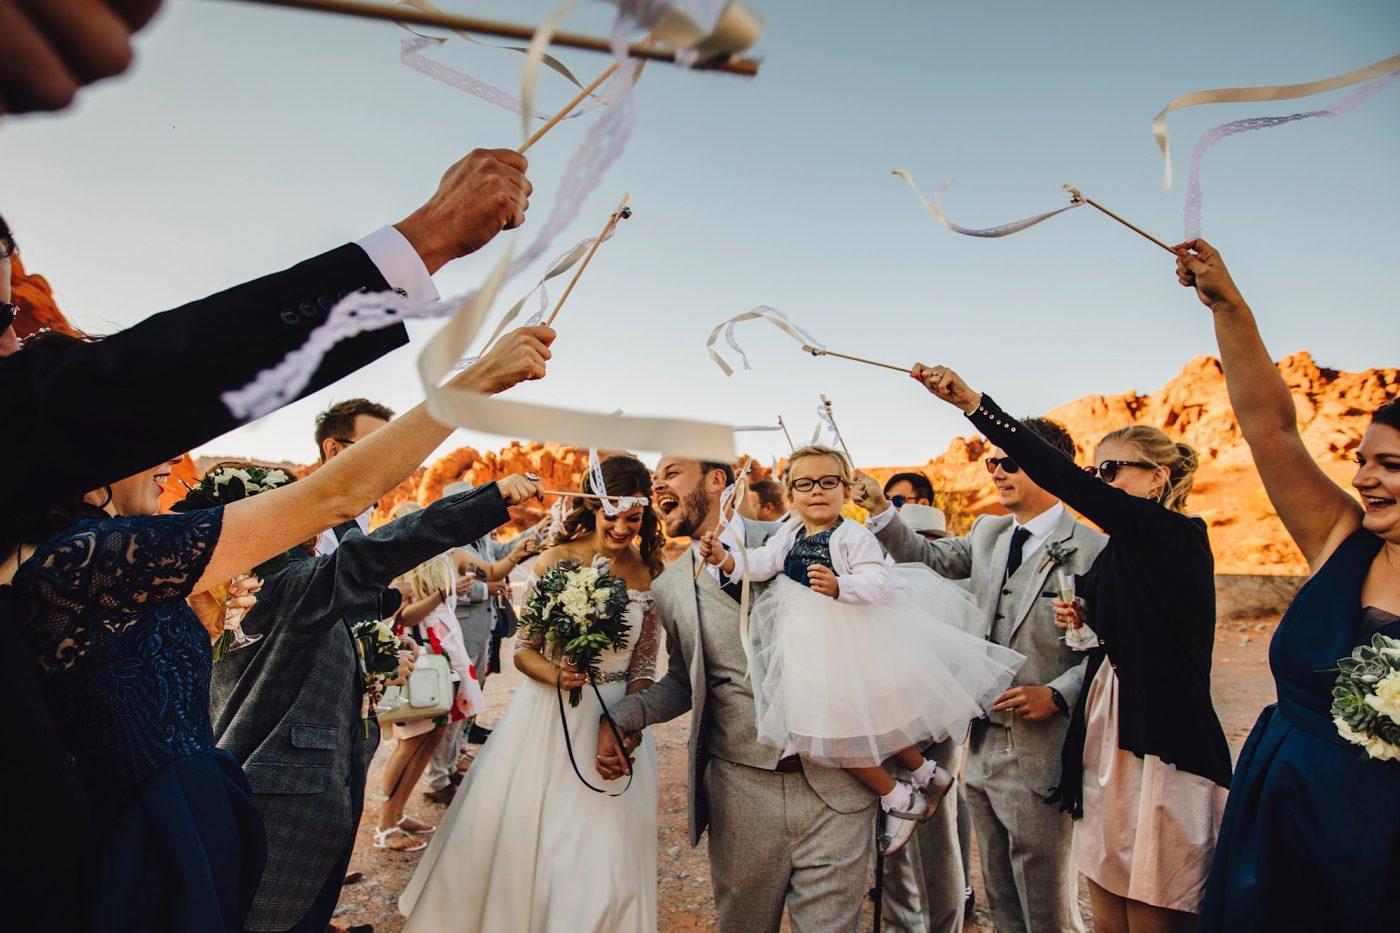 Wedding Photography by J S Coates Wedding Photography